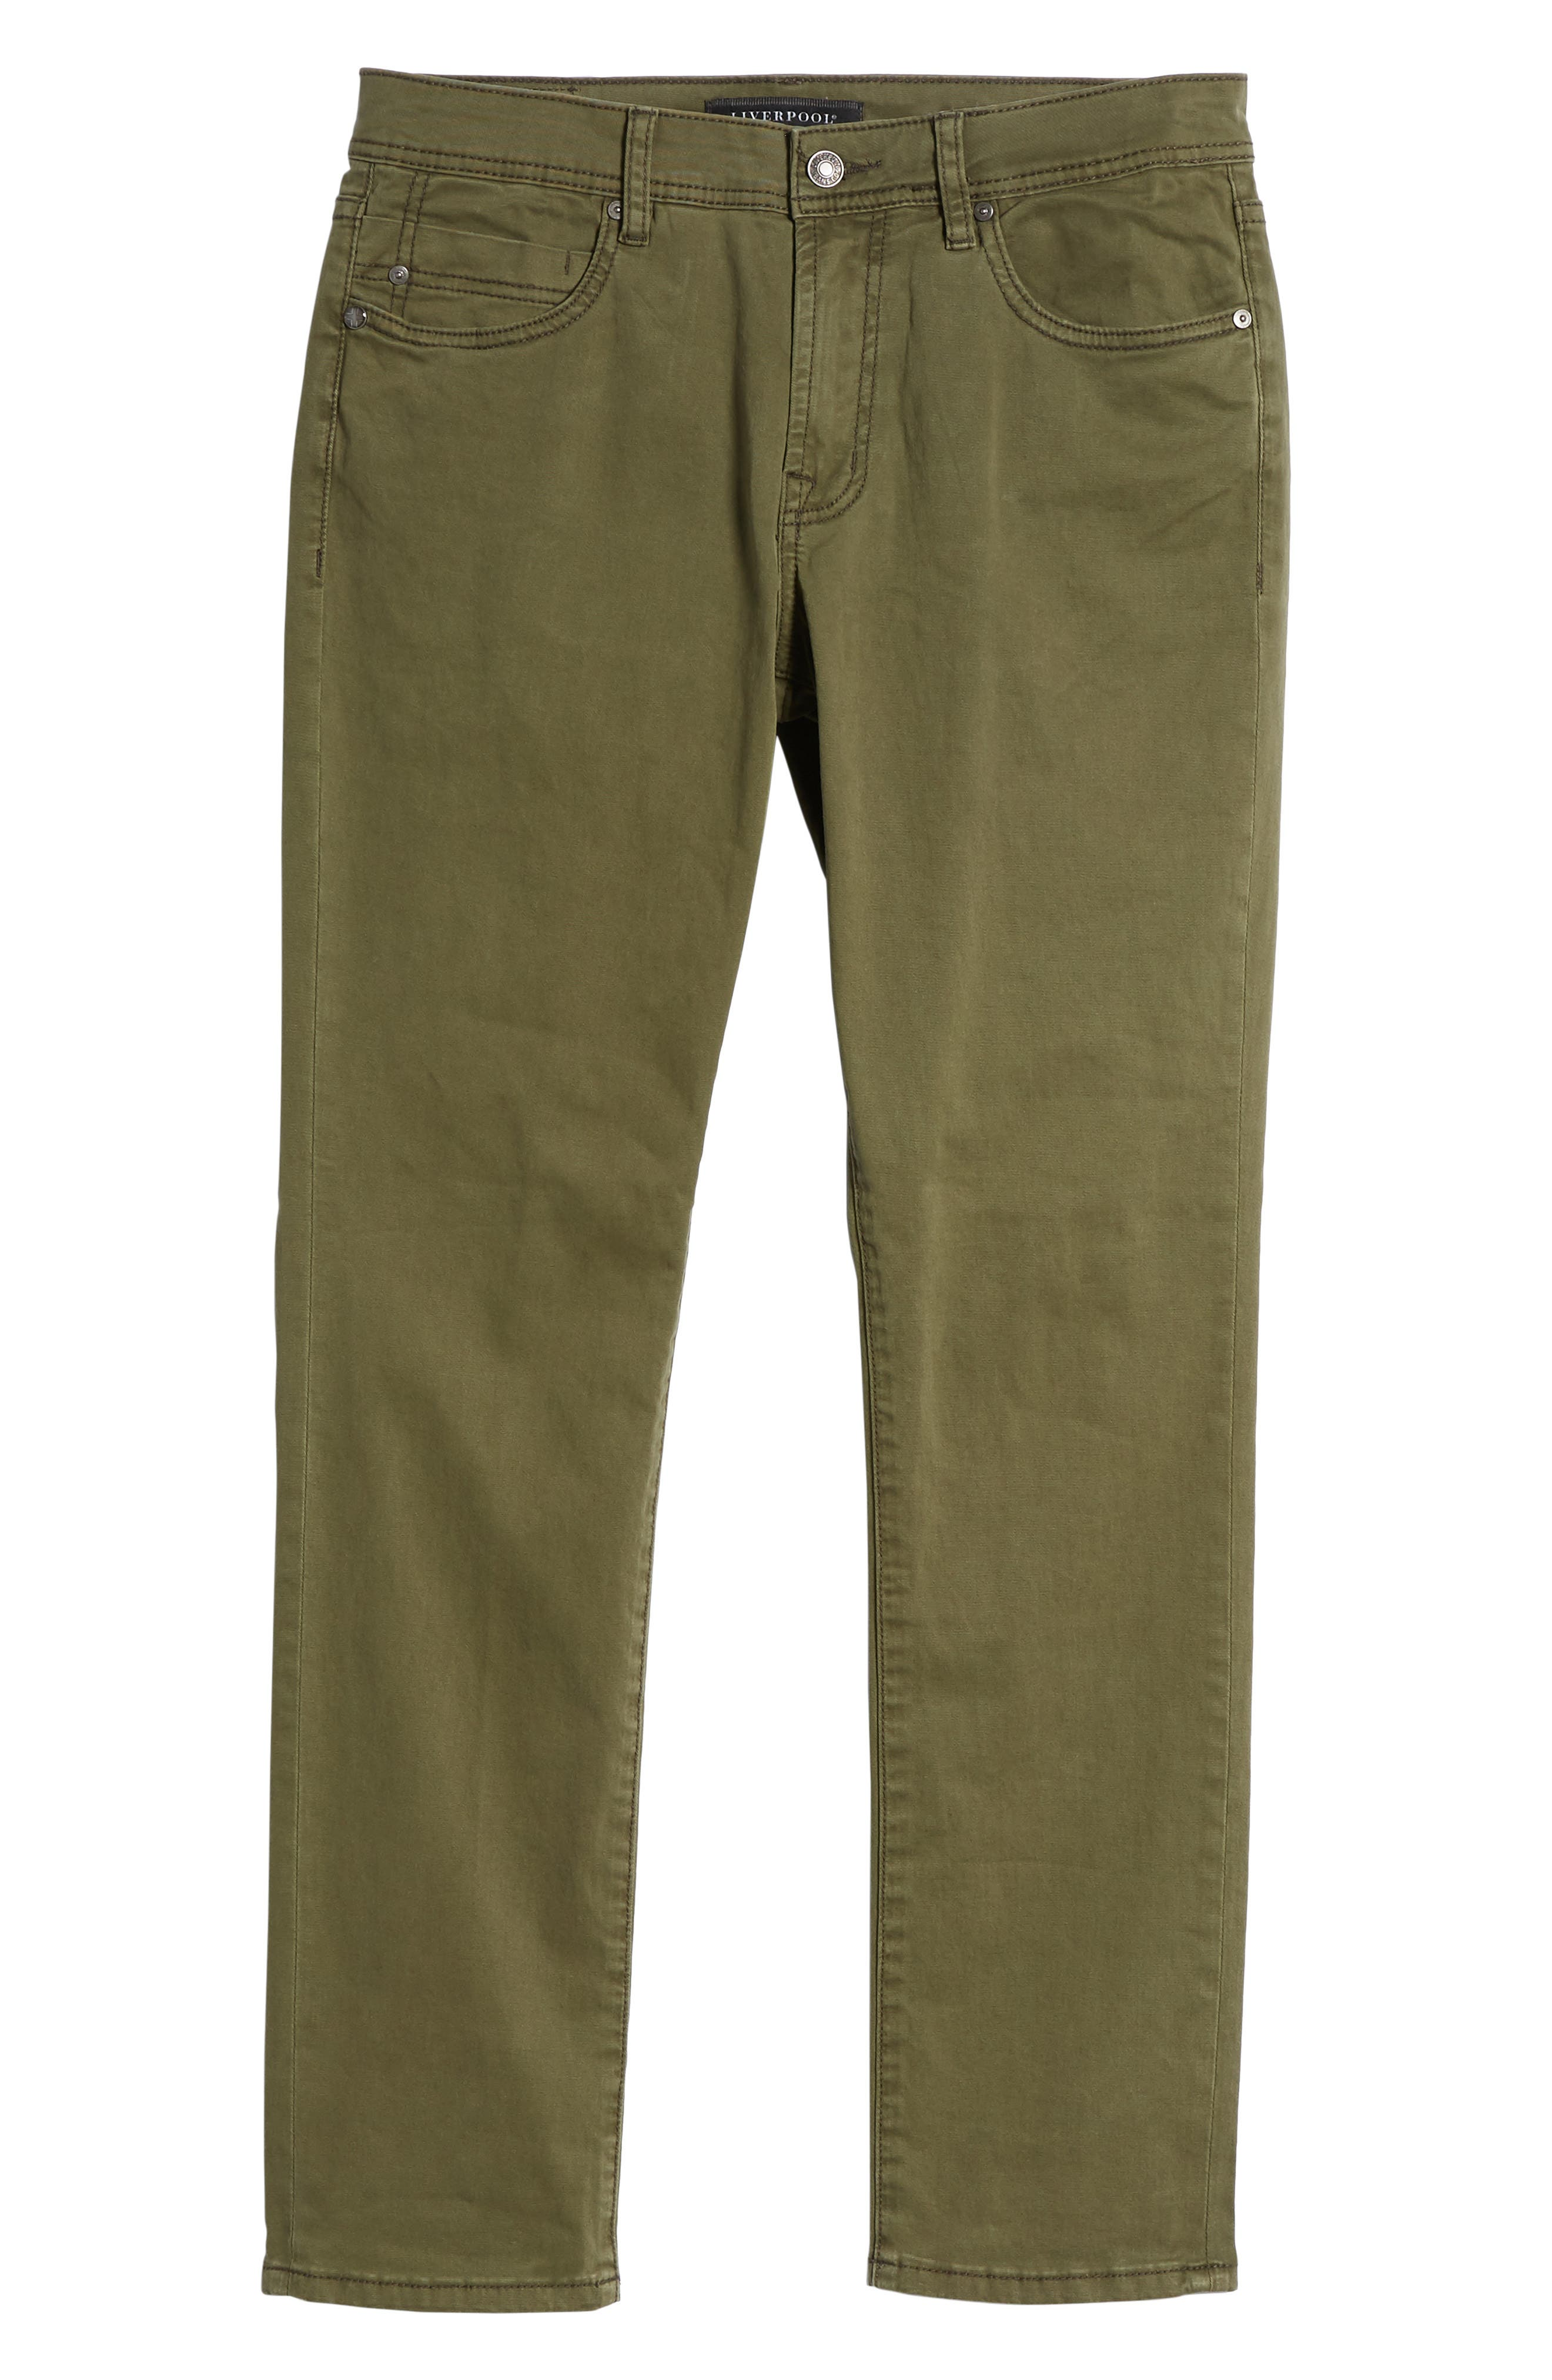 Jeans Co. Kingston Slim Straight Leg Jeans,                             Alternate thumbnail 6, color,                             Olive Night